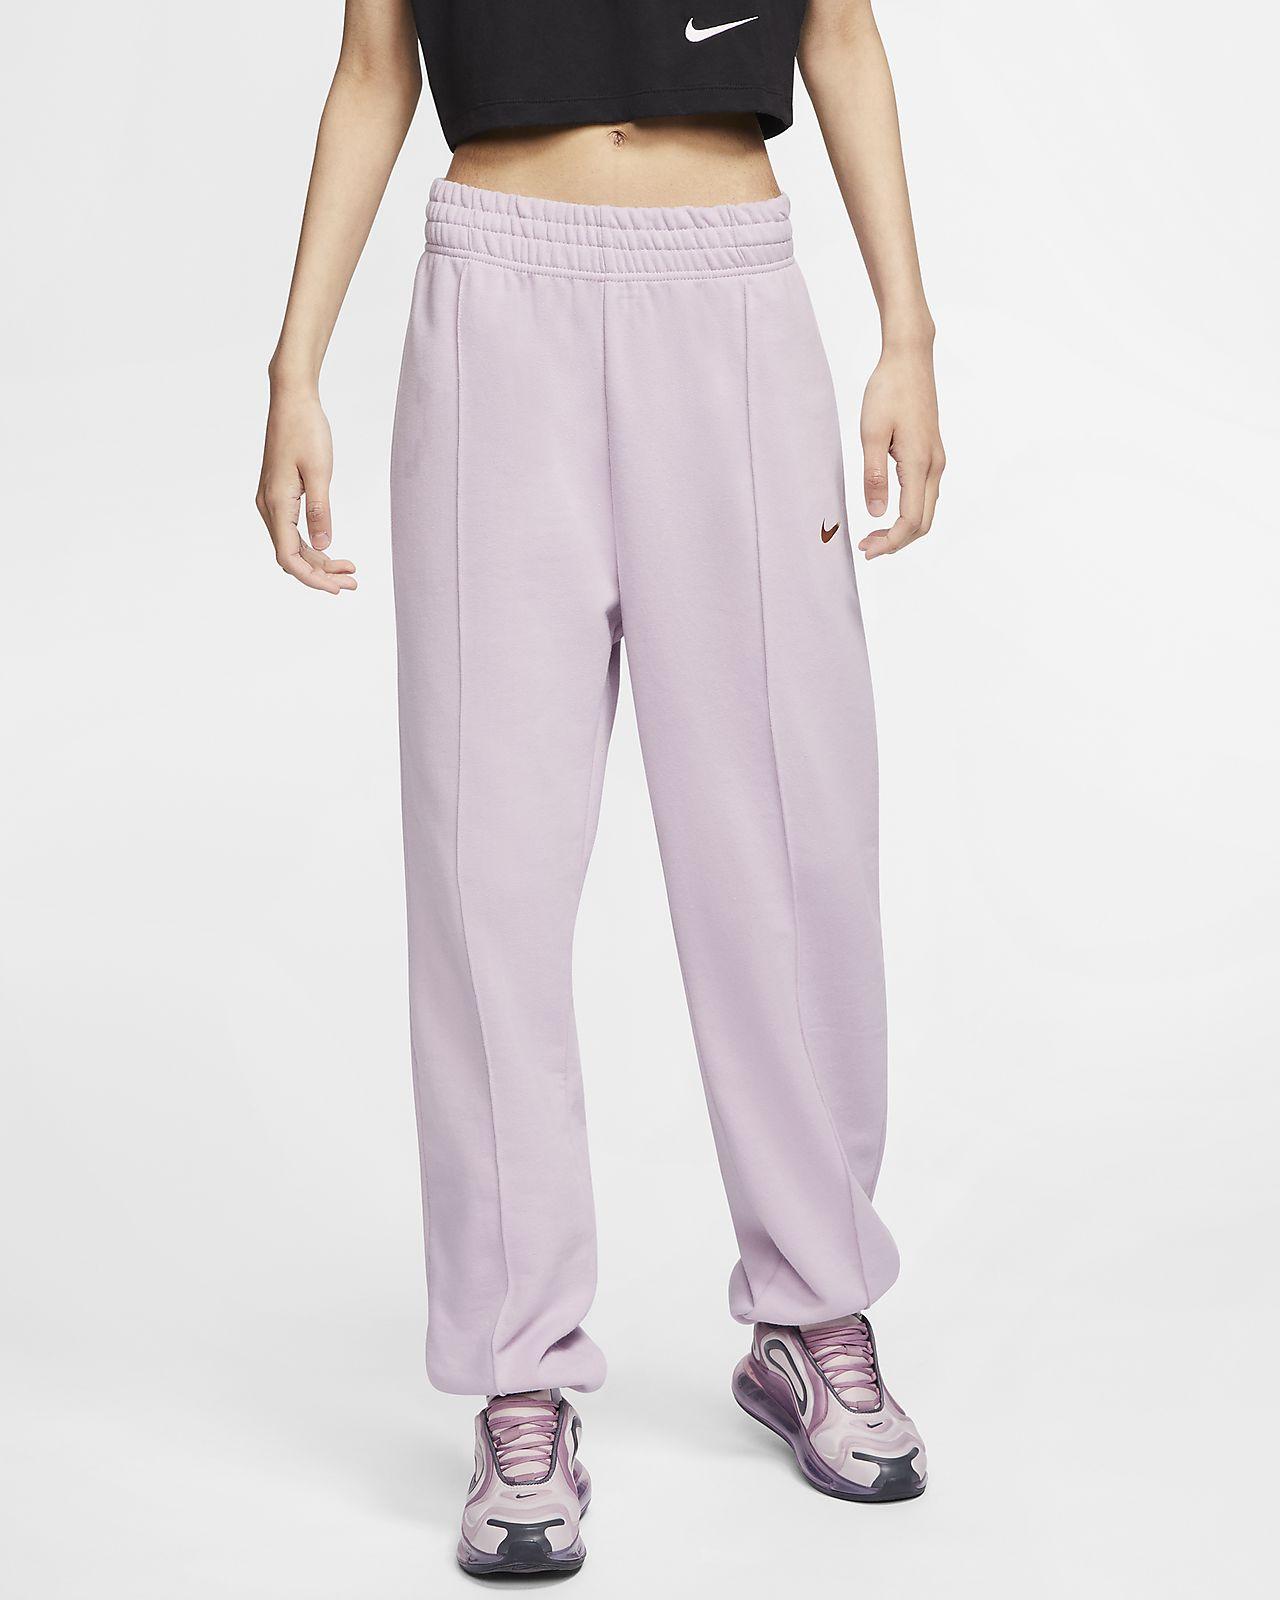 Nike Sportswear Trousers Iced Lilac